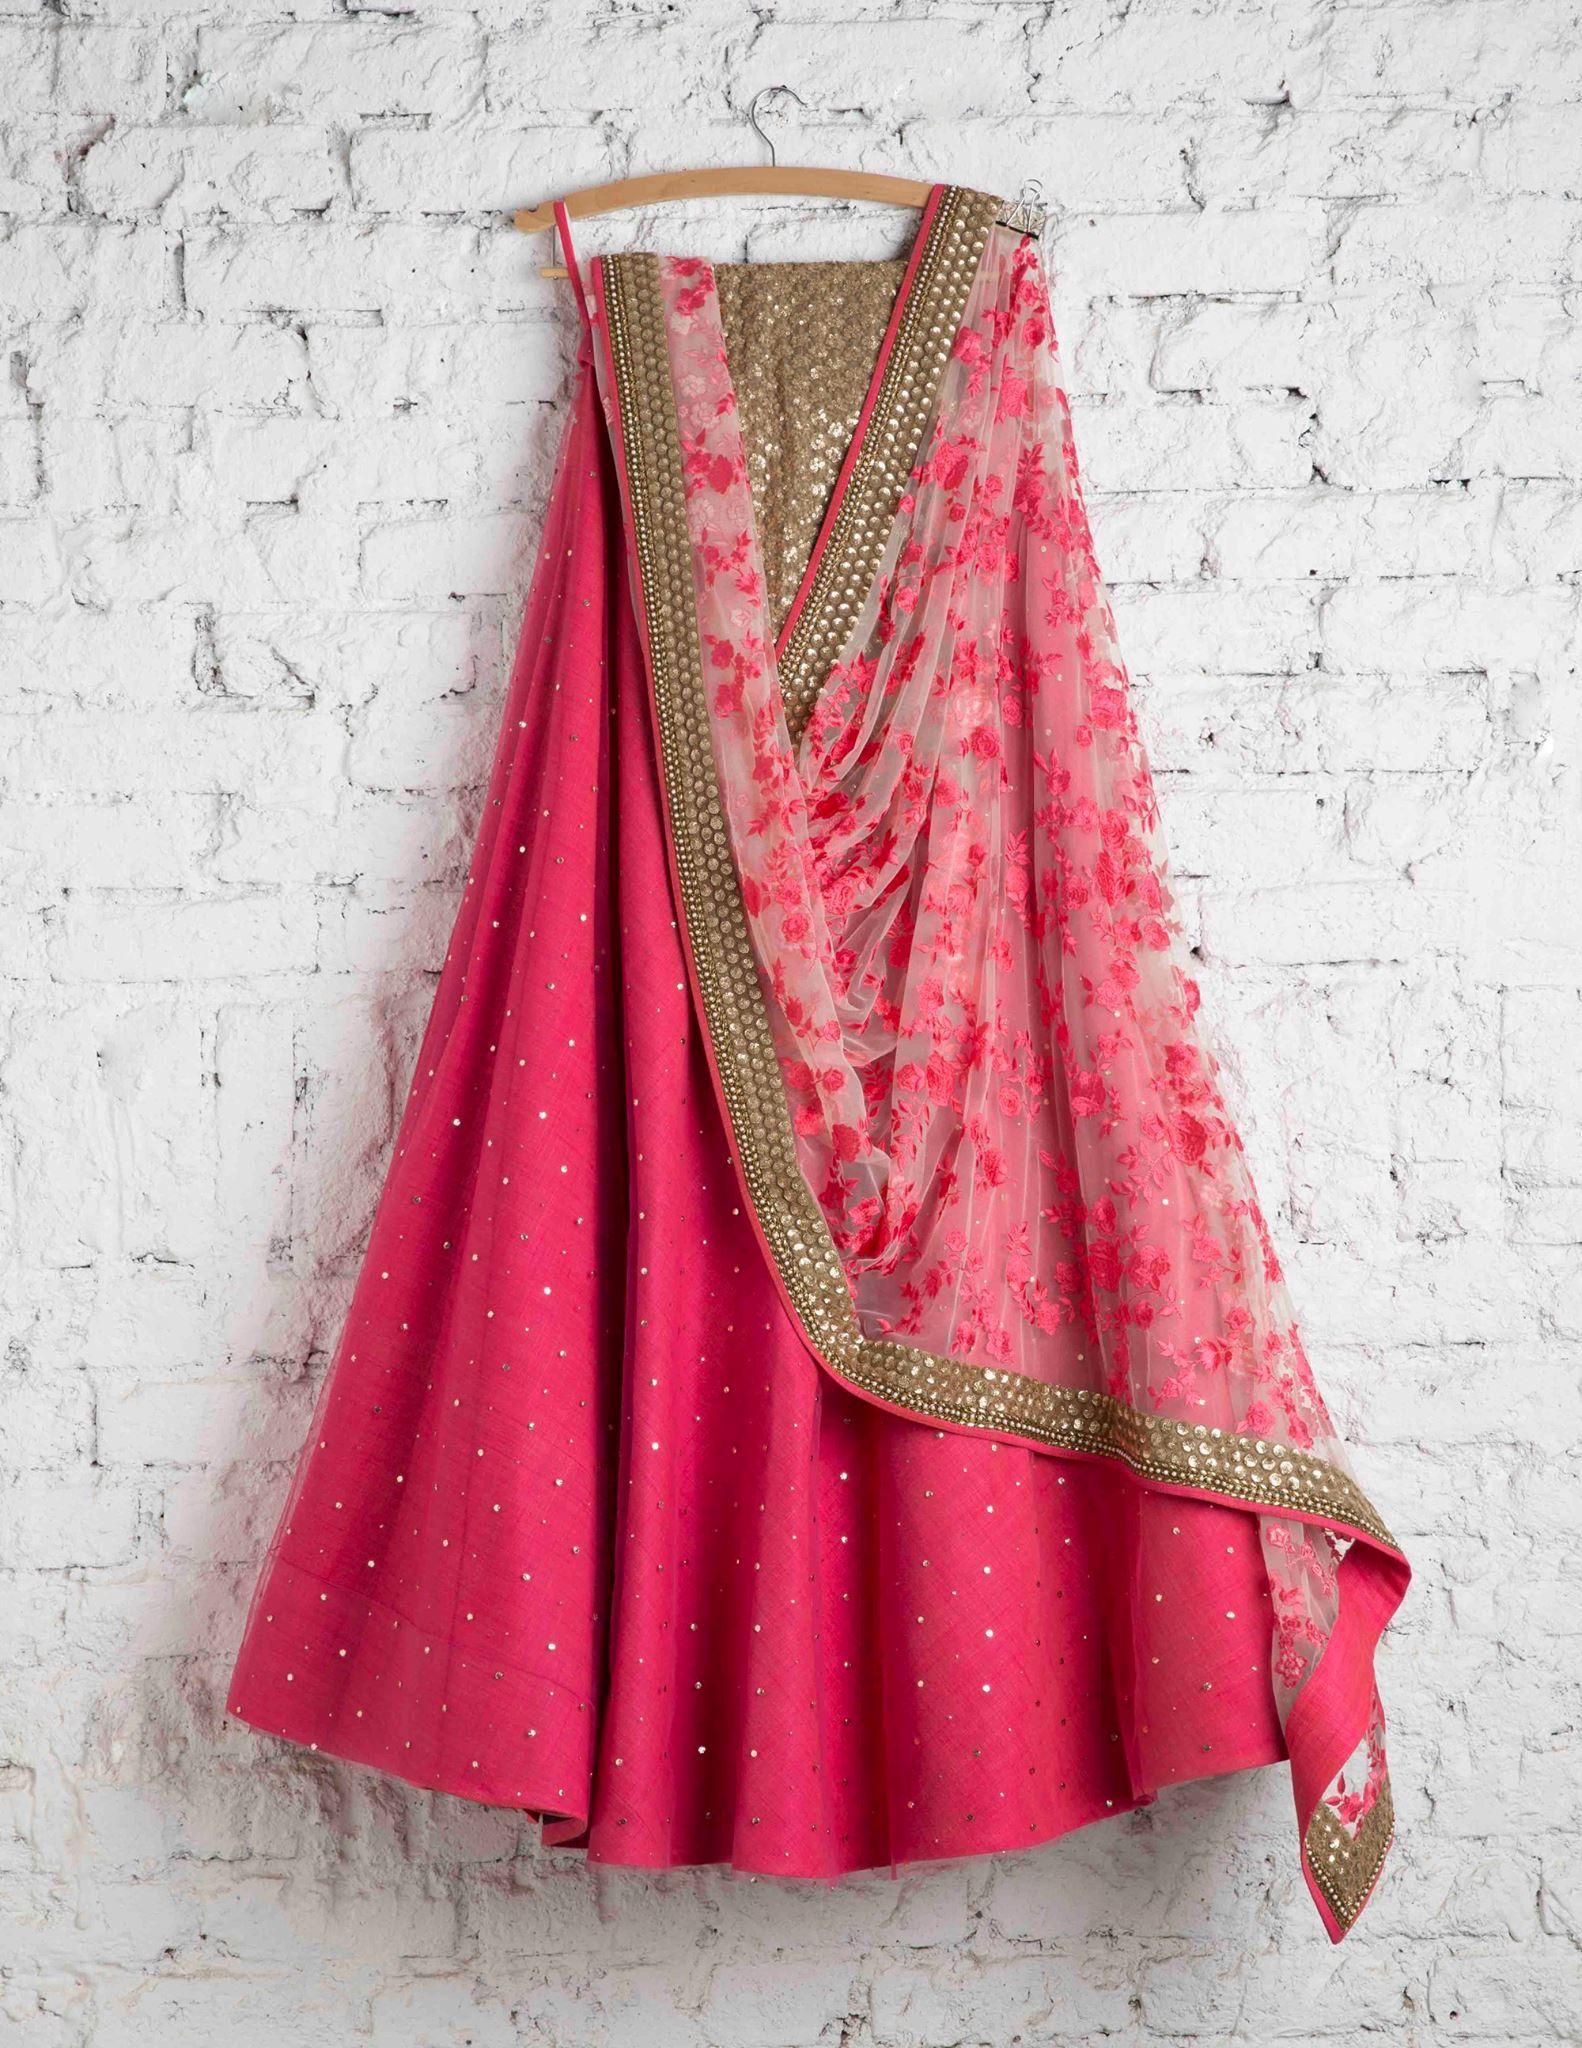 Pin de Aayushi Rohra en The Closet | Pinterest